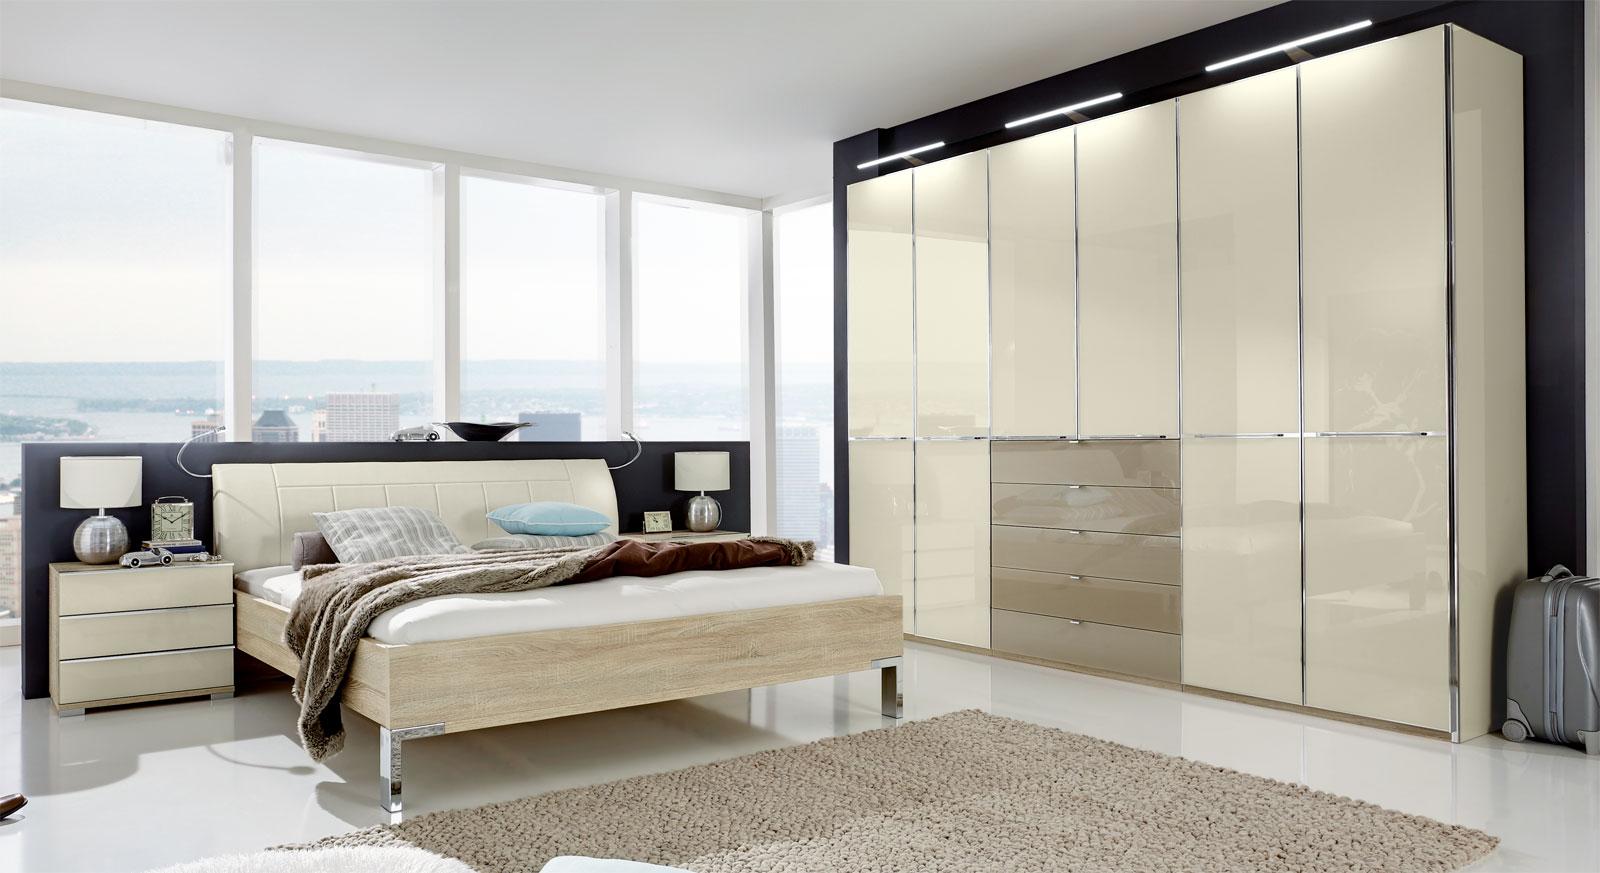 Schlafzimmer banga mit modernem material mix